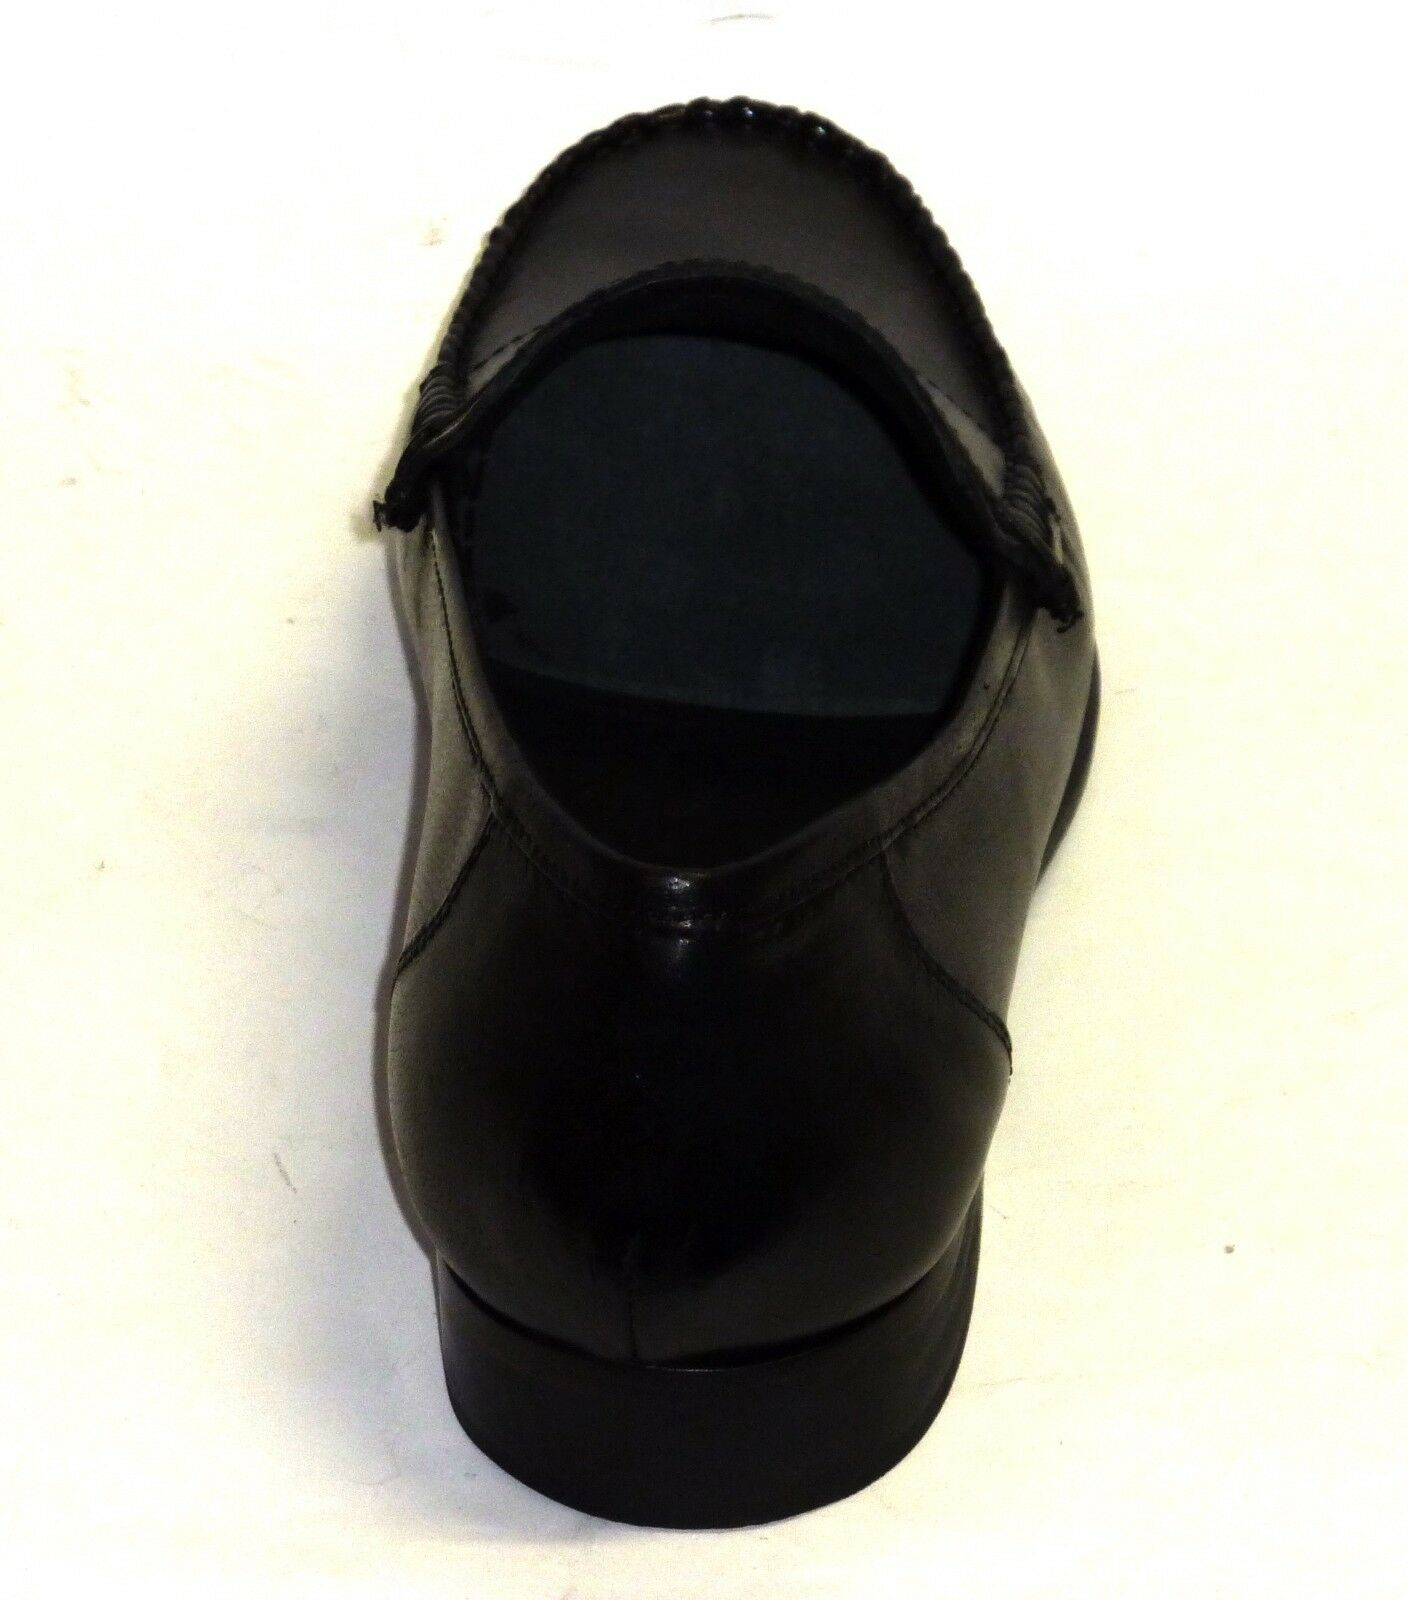 Mokassin Schuhe n.41 elegante Männerschuhe schwarzes Leder n.41 Schuhe 480148